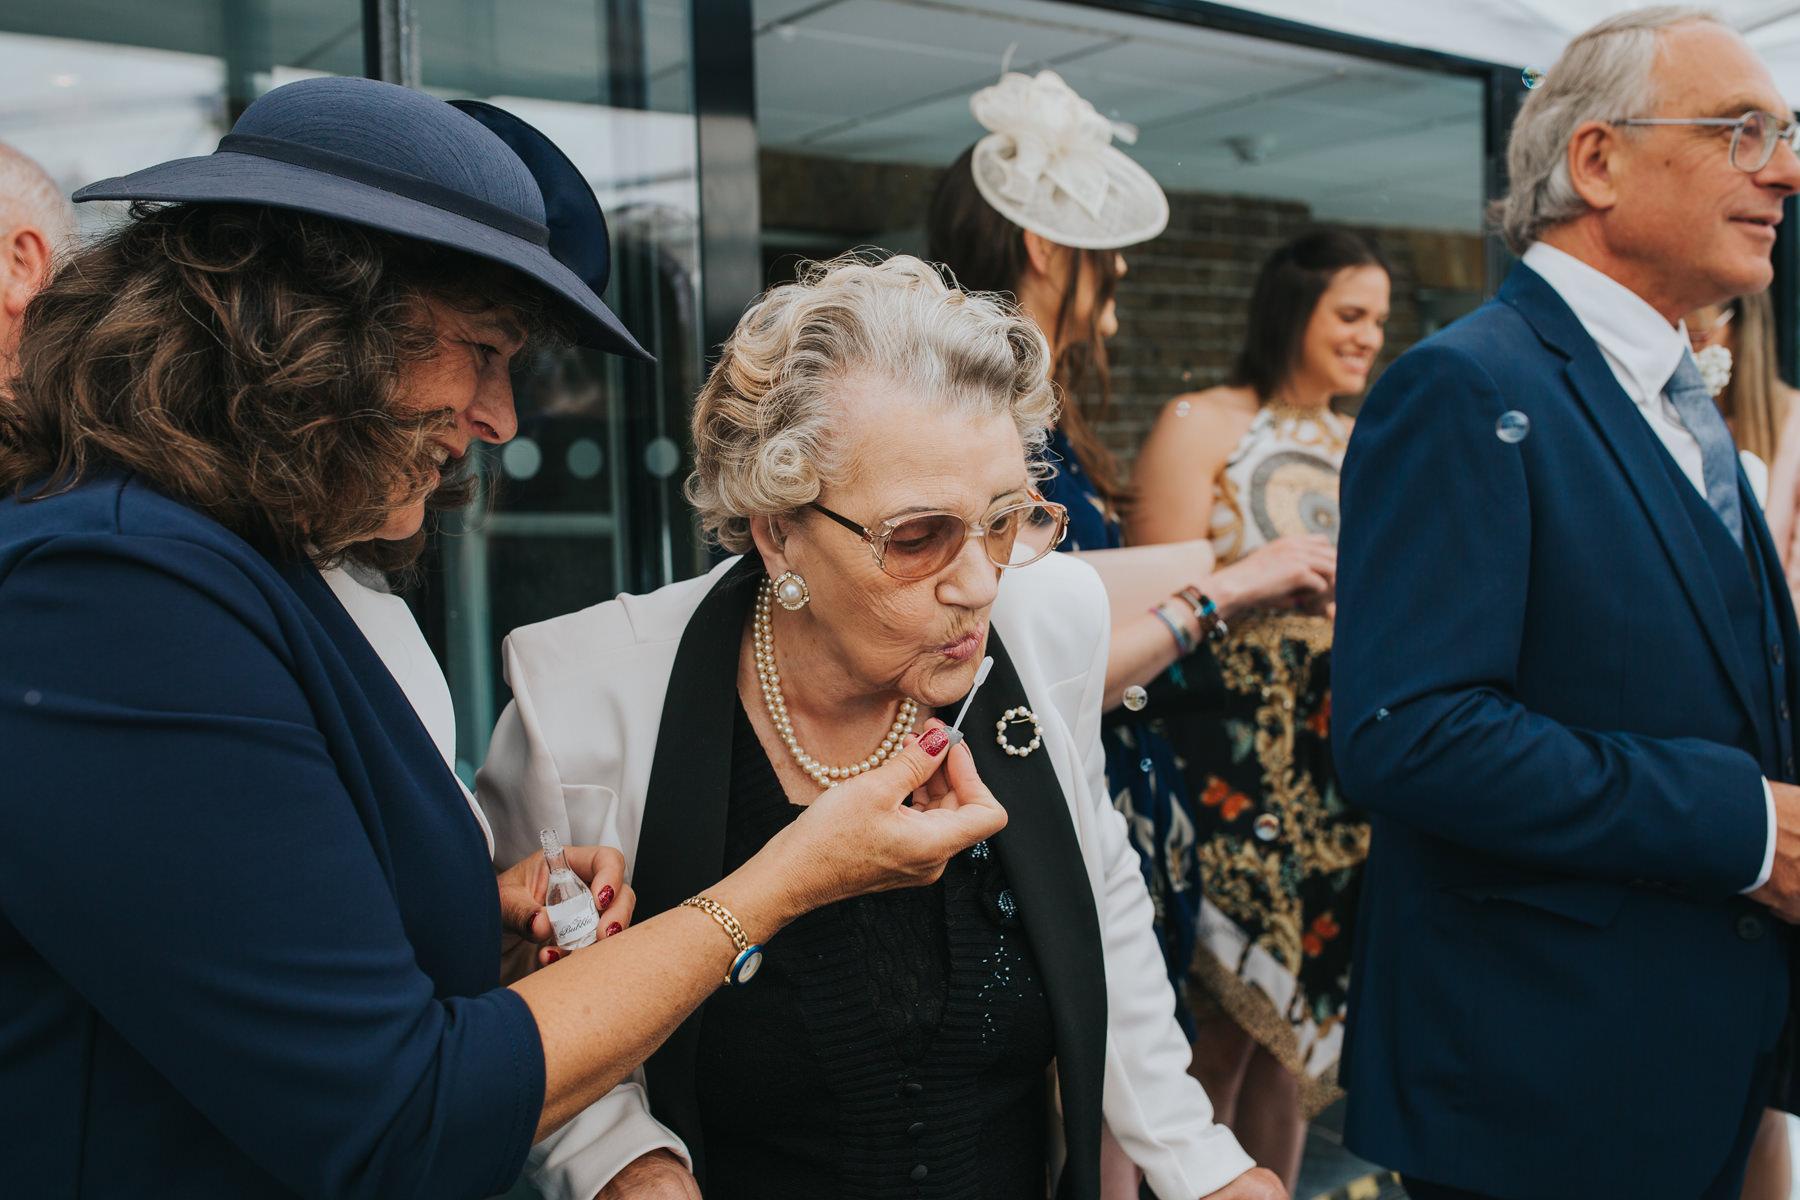 CRL-241-The Bingham Wedding Richmond-groom bride guests blowing bubbles balcony.jpg